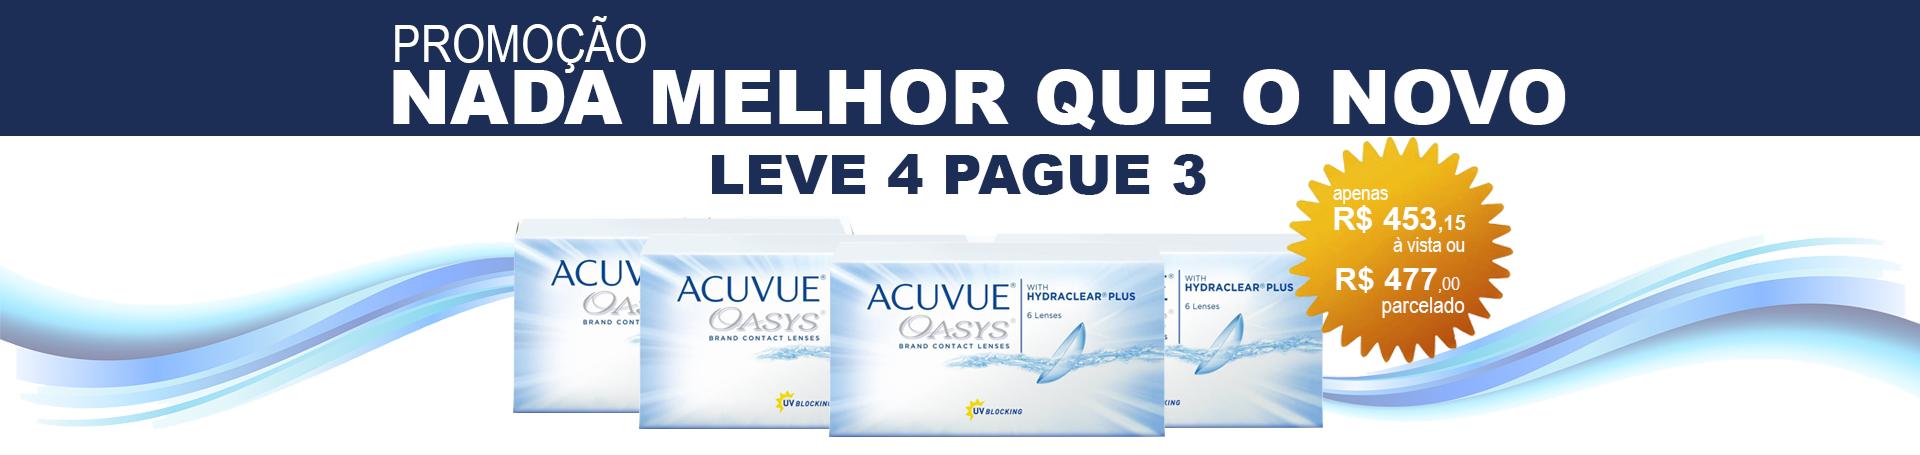 Acuvue Oasys - NMQN